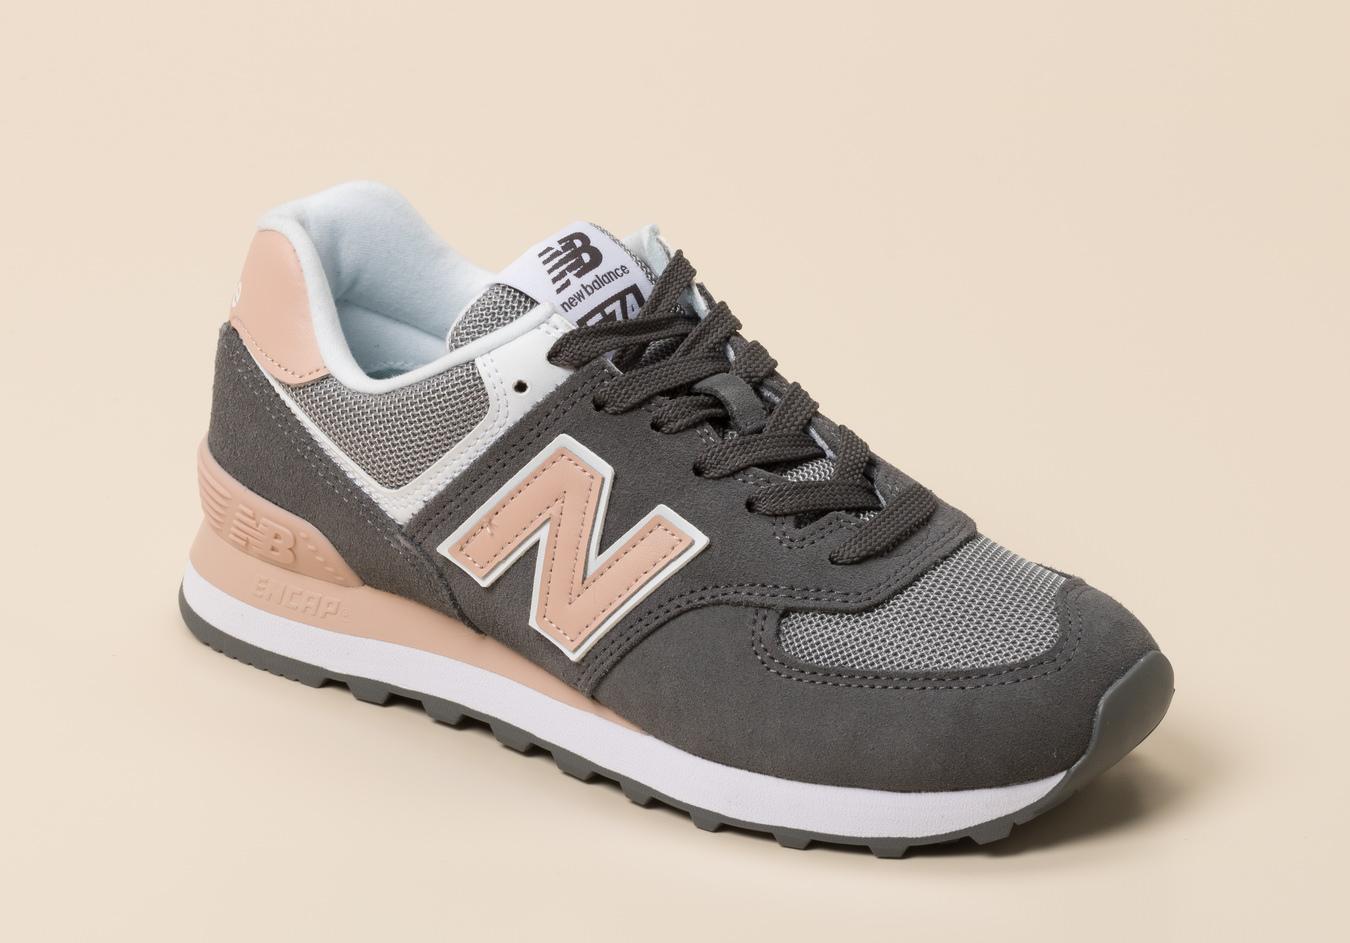 quality design 5df44 841e3 New Balance Damen Sneaker in grau kaufen   Zumnorde Online-Shop